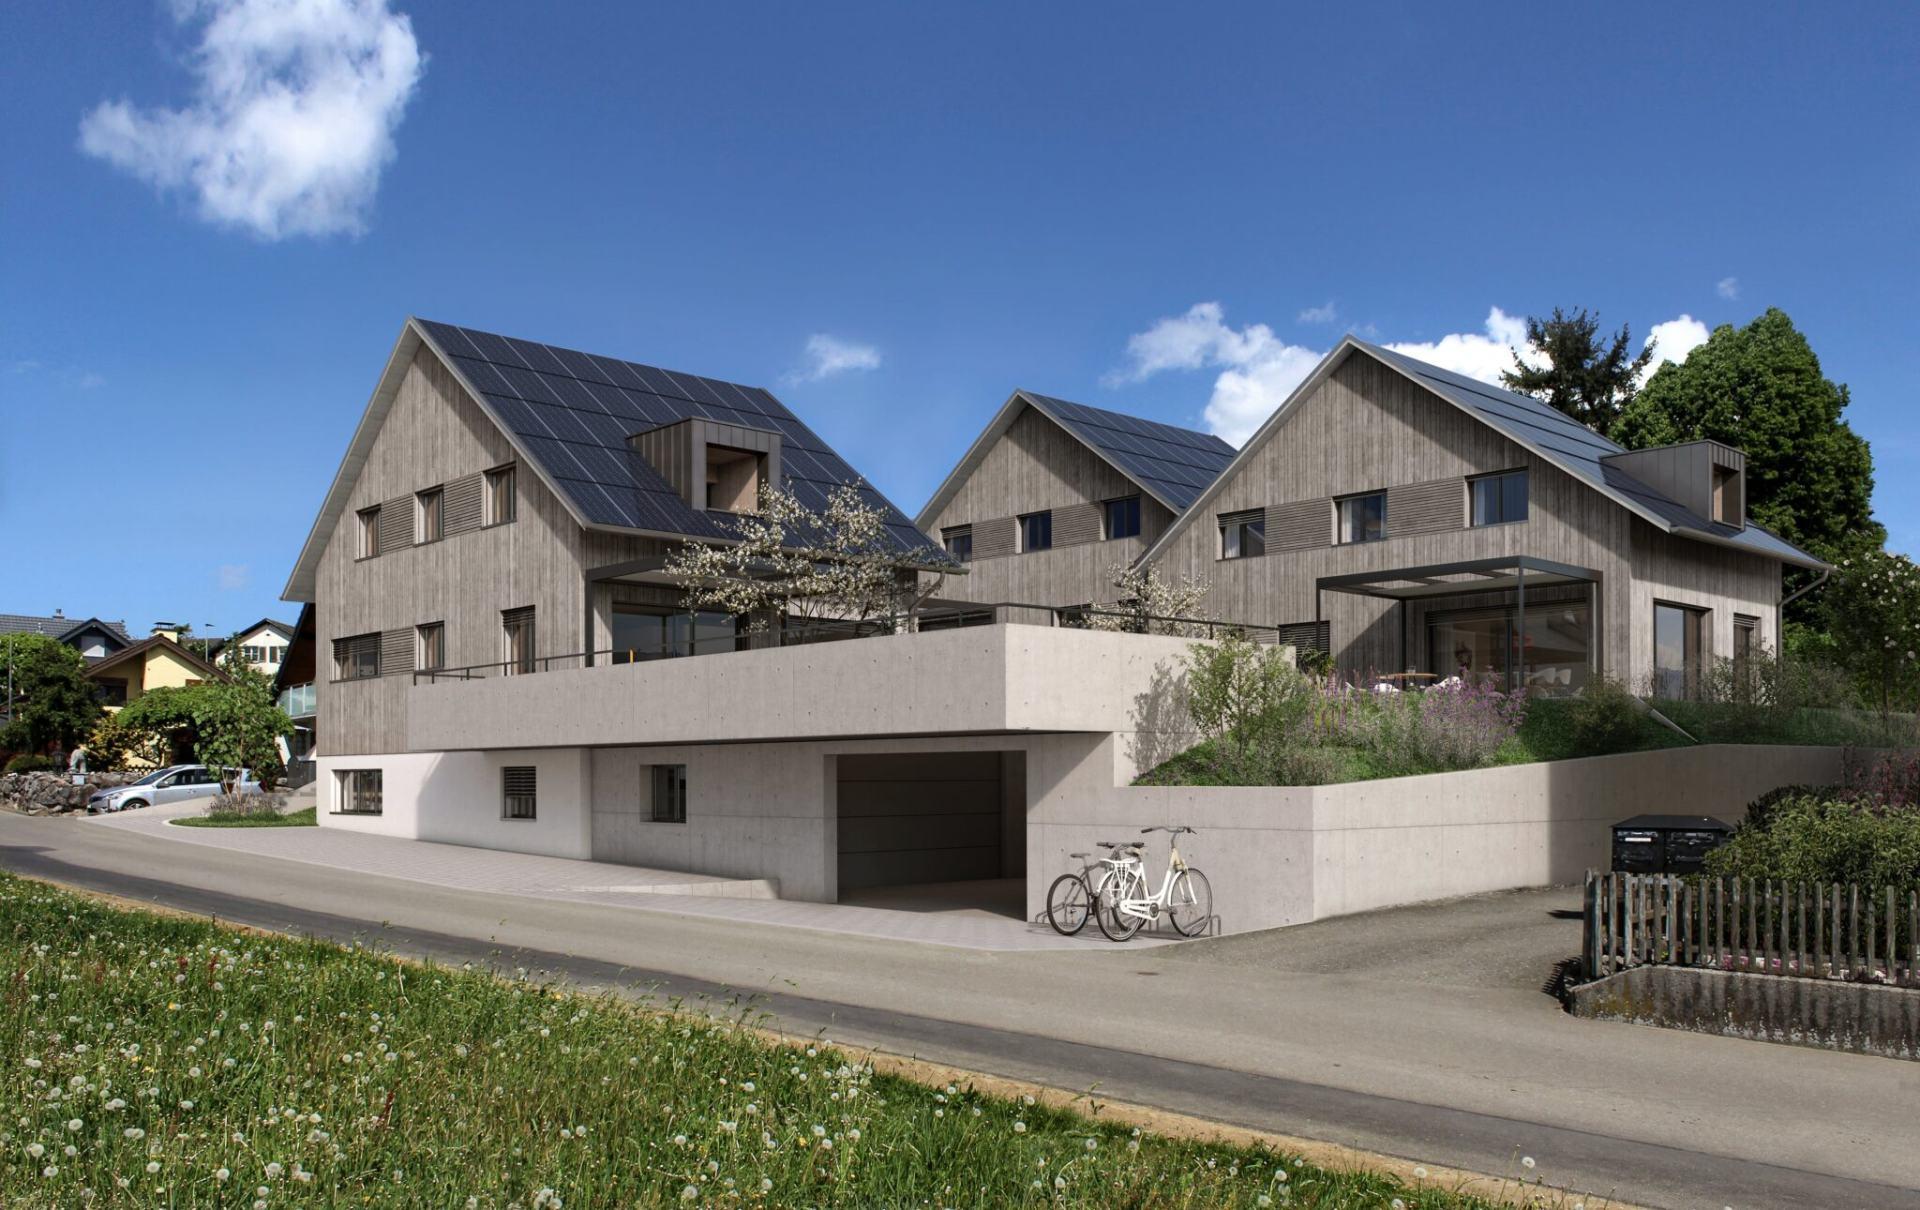 Triple-Solar-Houses, 3 EFH am Moosweg in Bünzen